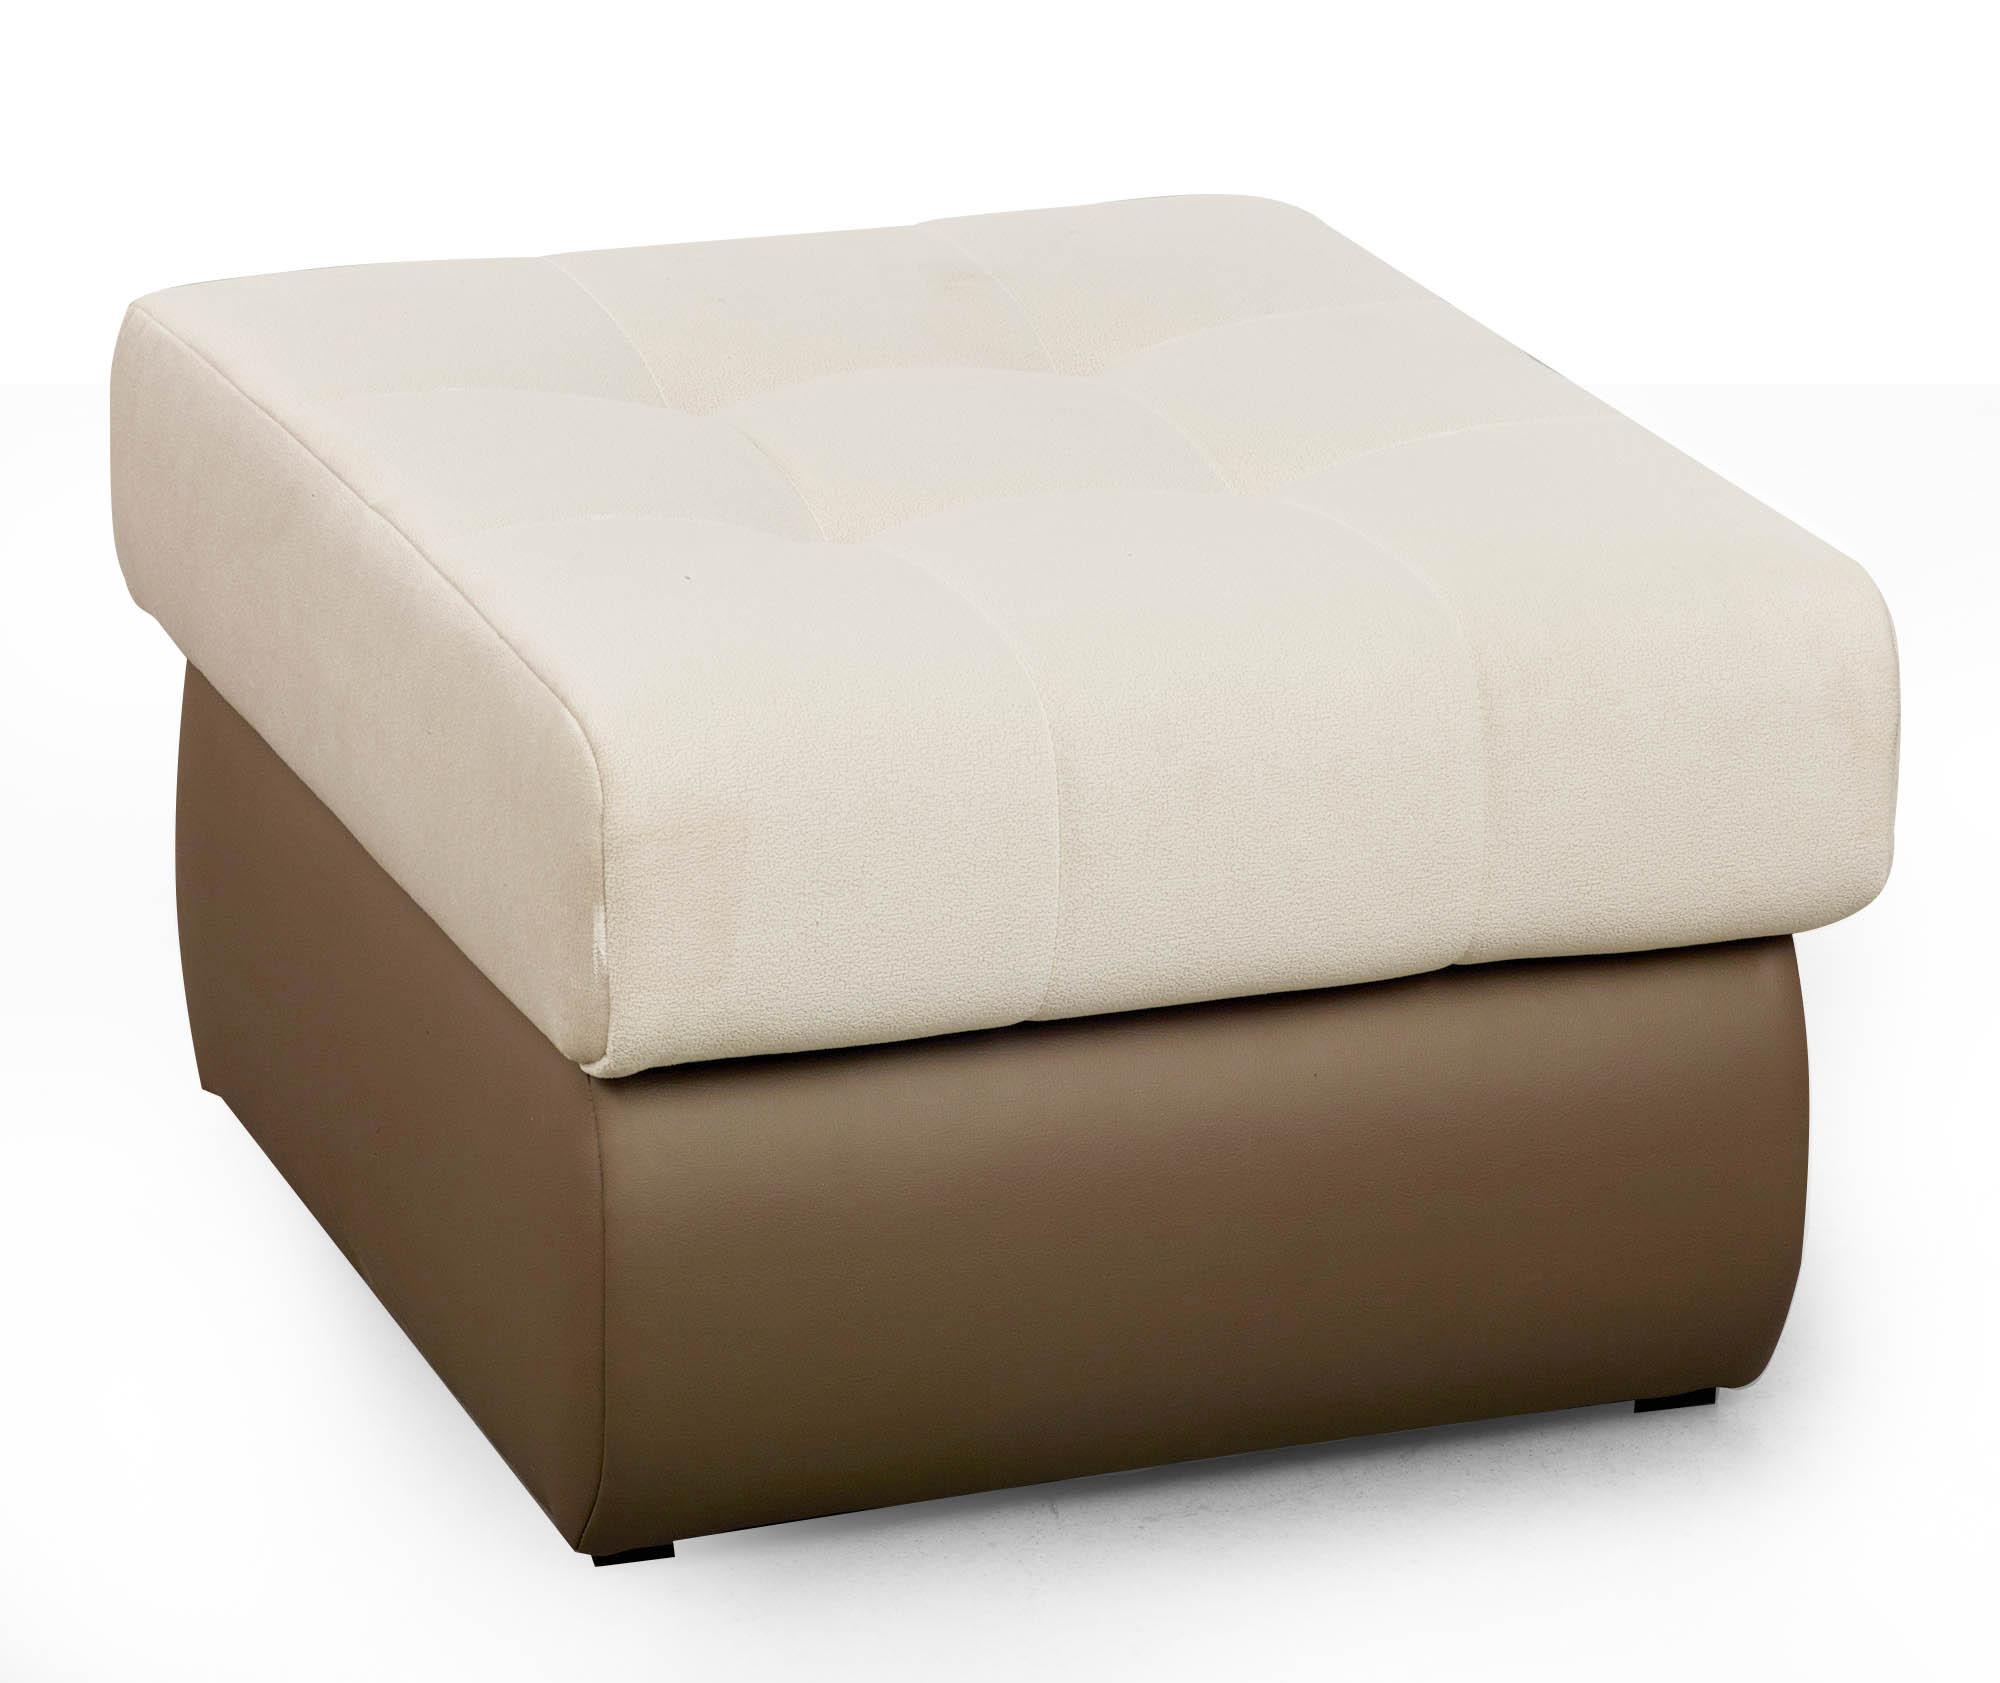 Taburet tapitat cu stofa si piele ecologica Aldo White l70xA62xH41 cm